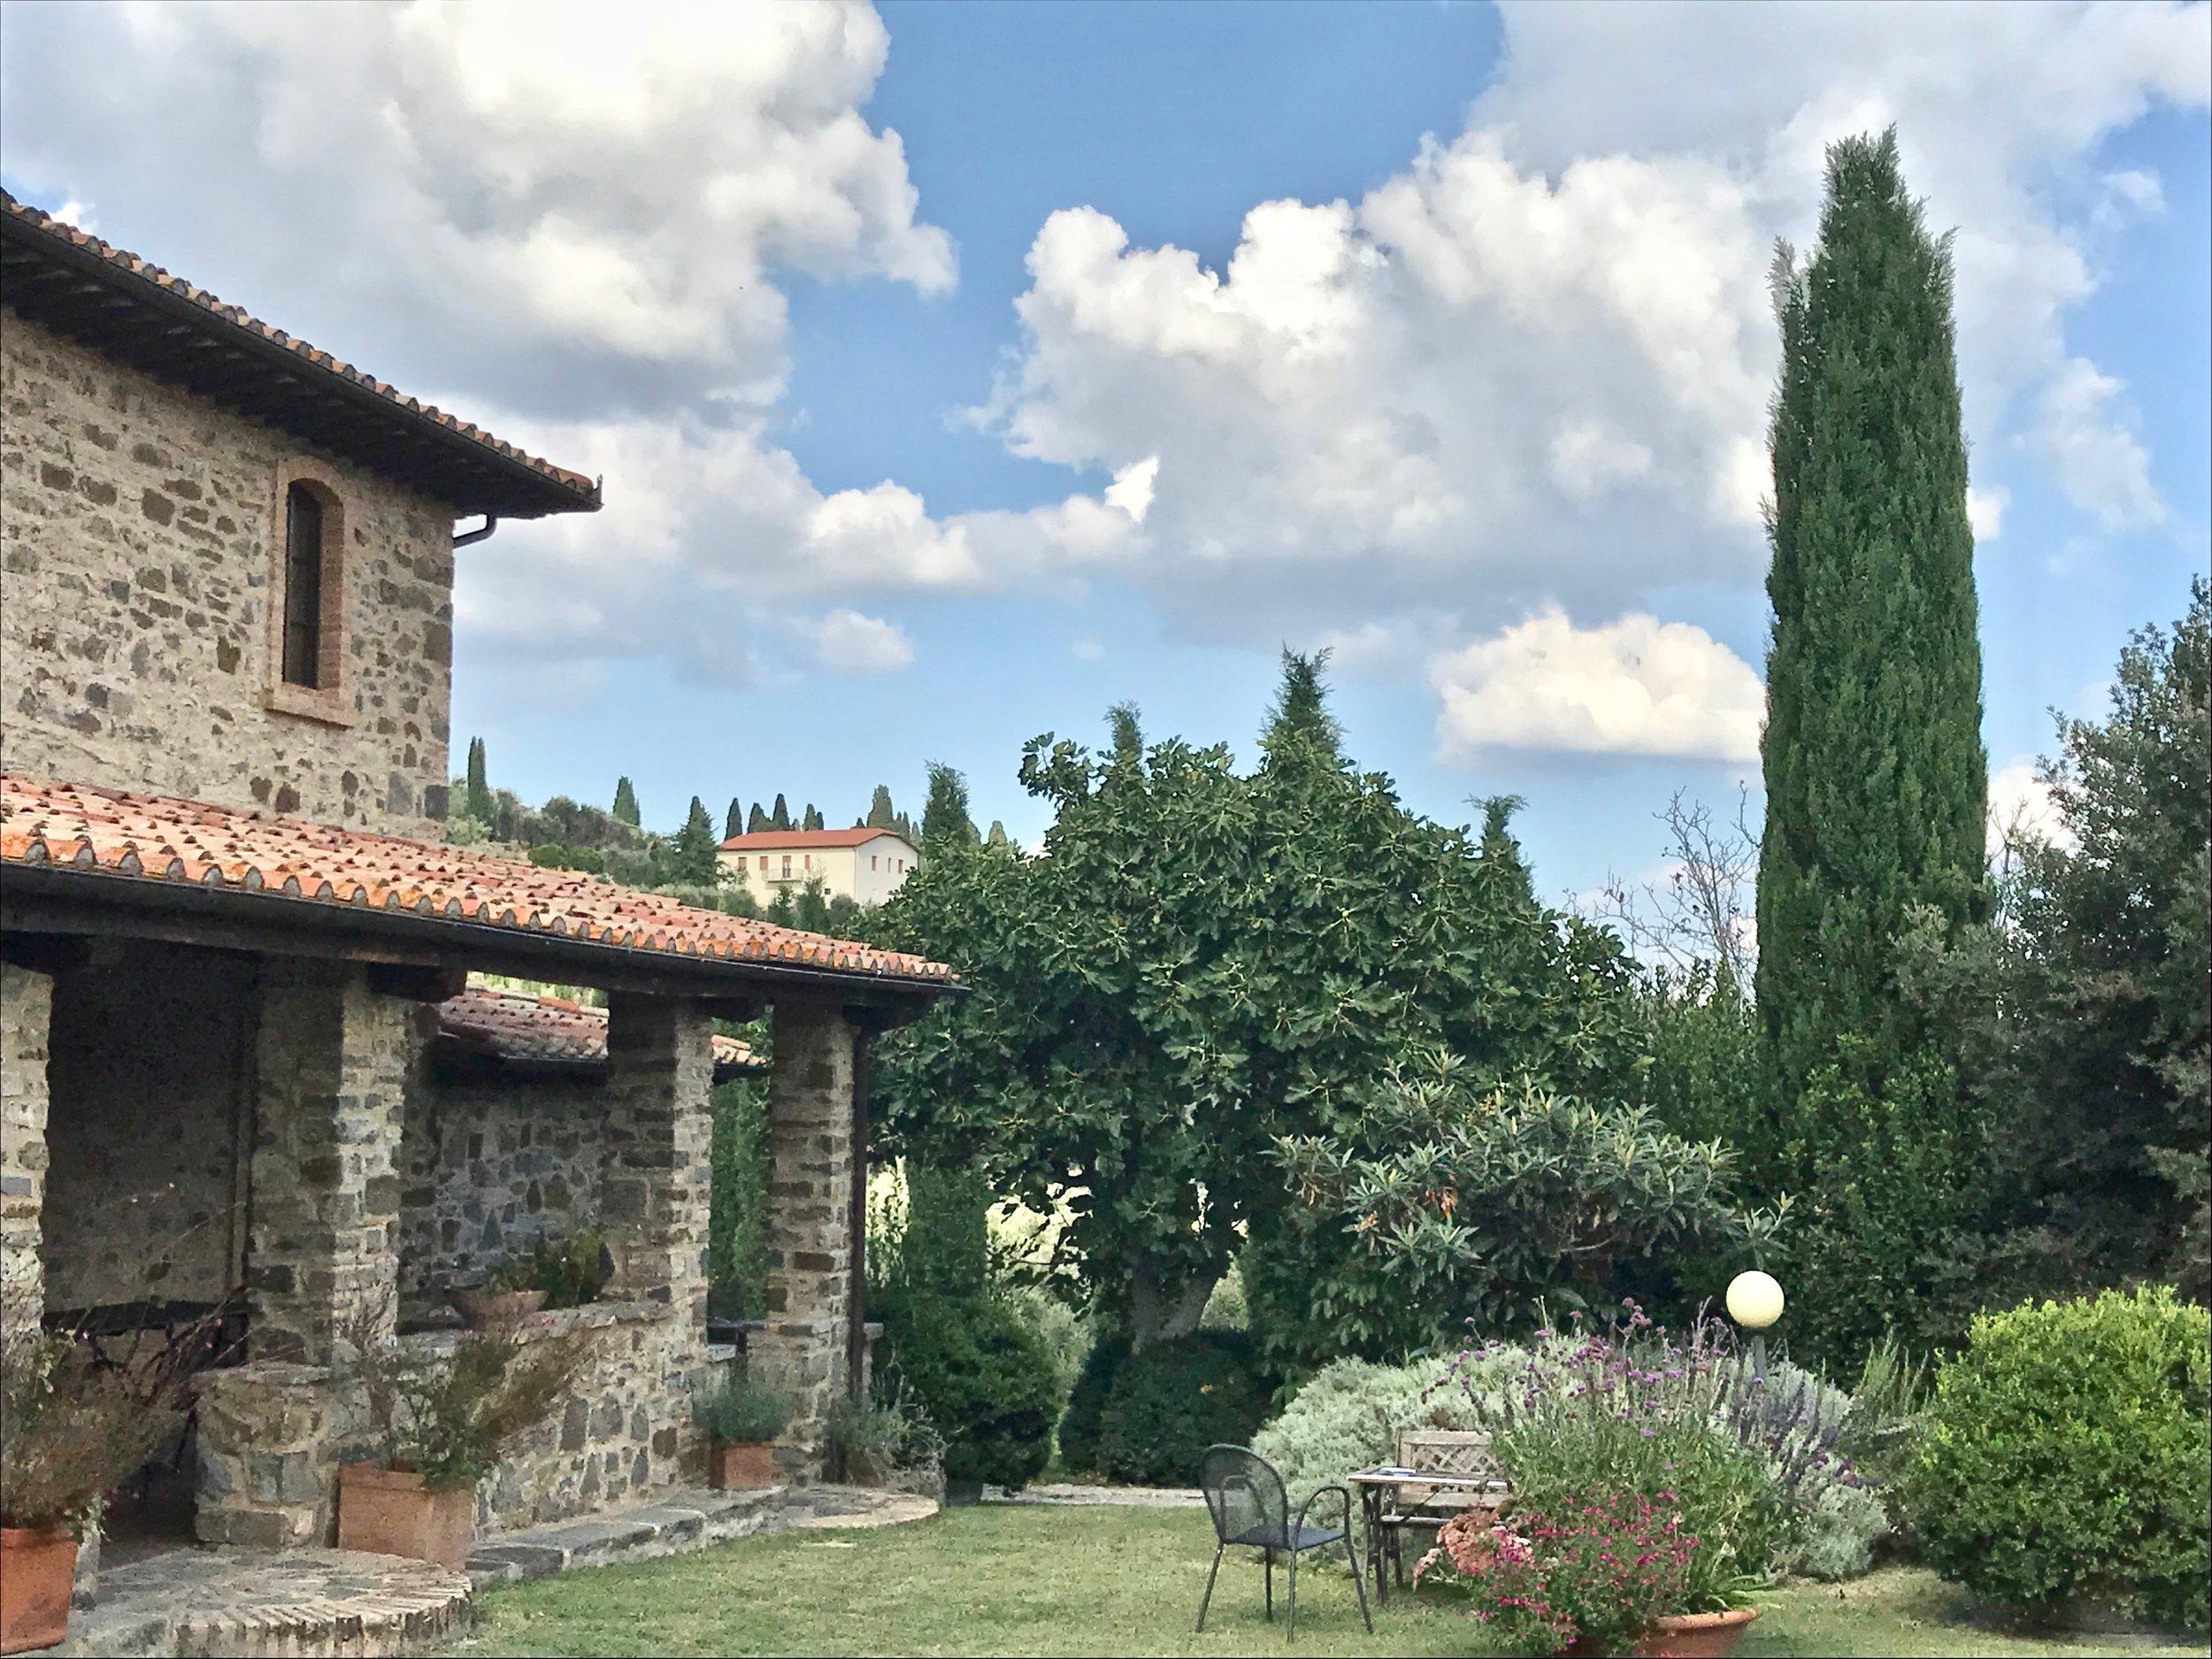 The charm of Montecucco shines through at Peteglia winery.